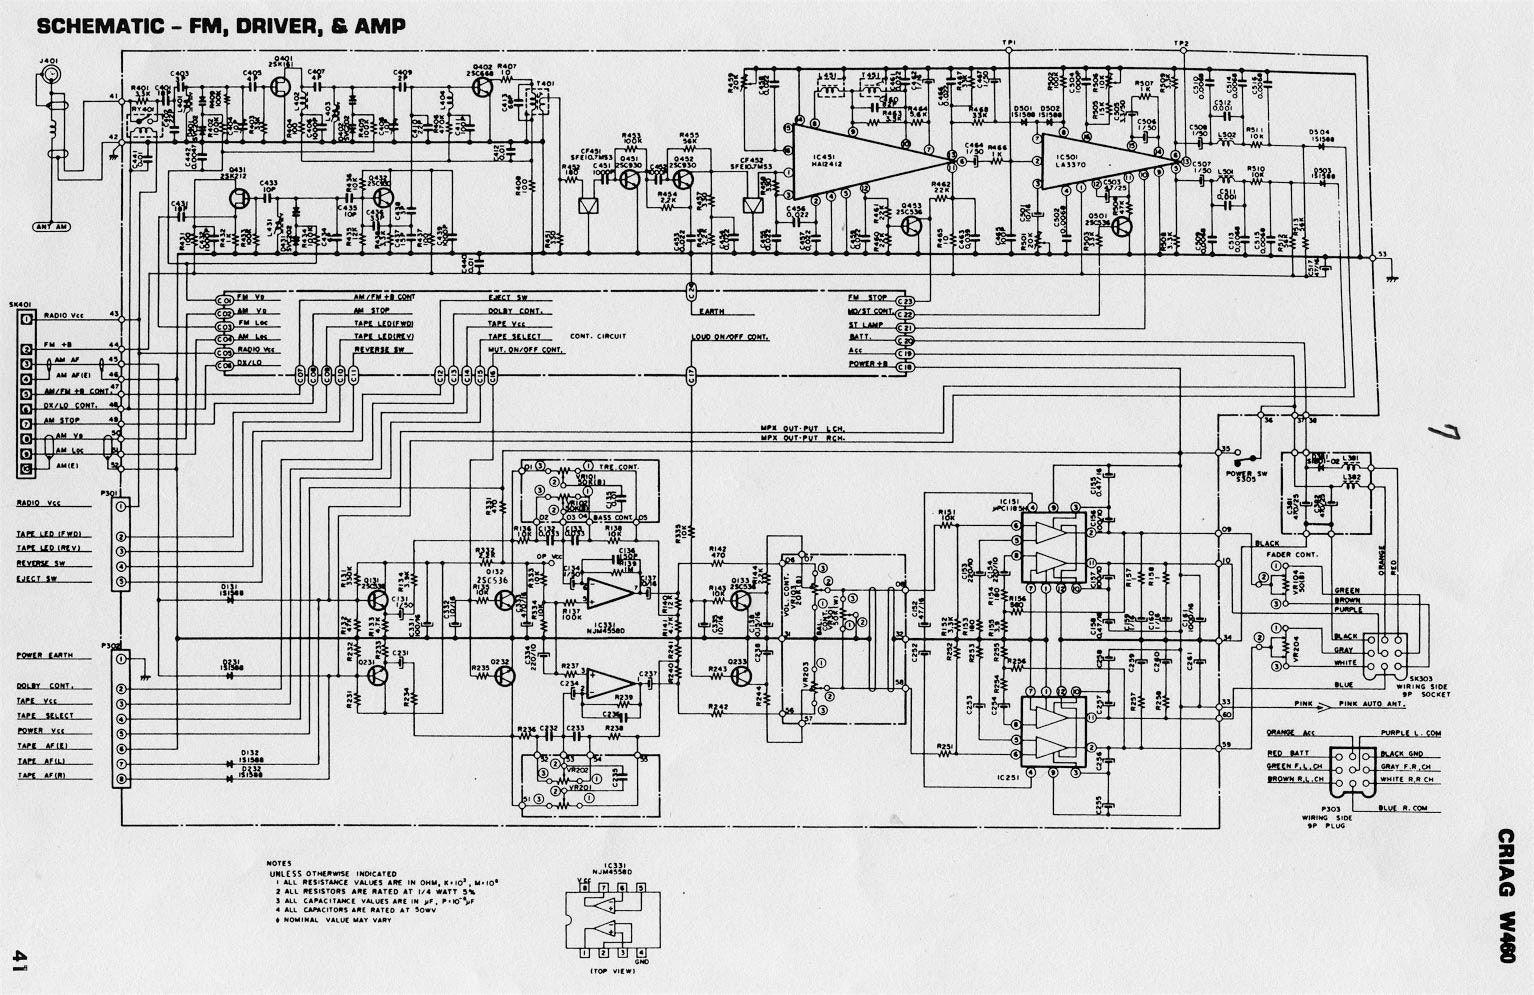 [SCHEMATICS_4JK]  XK_8006] Renault Laguna I Wiring Diagram Free Diagram   Renault Laguna I Wiring Diagram      Itis Oxyt Tomy Itive Kumb Sequ Phae Mohammedshrine Librar Wiring 101